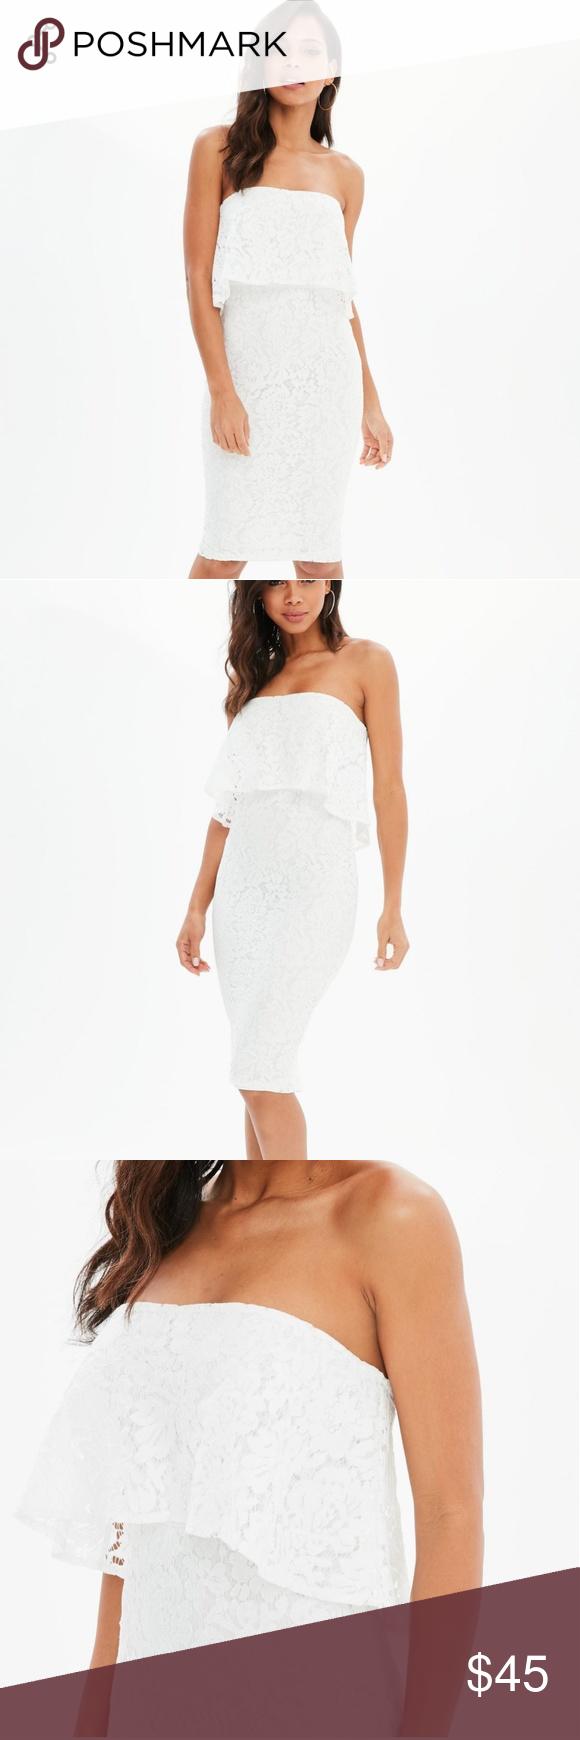 9a4d9df4b3 NWT white lace bandeau frill midi dress NWT white midi dress featuring lace  fabric